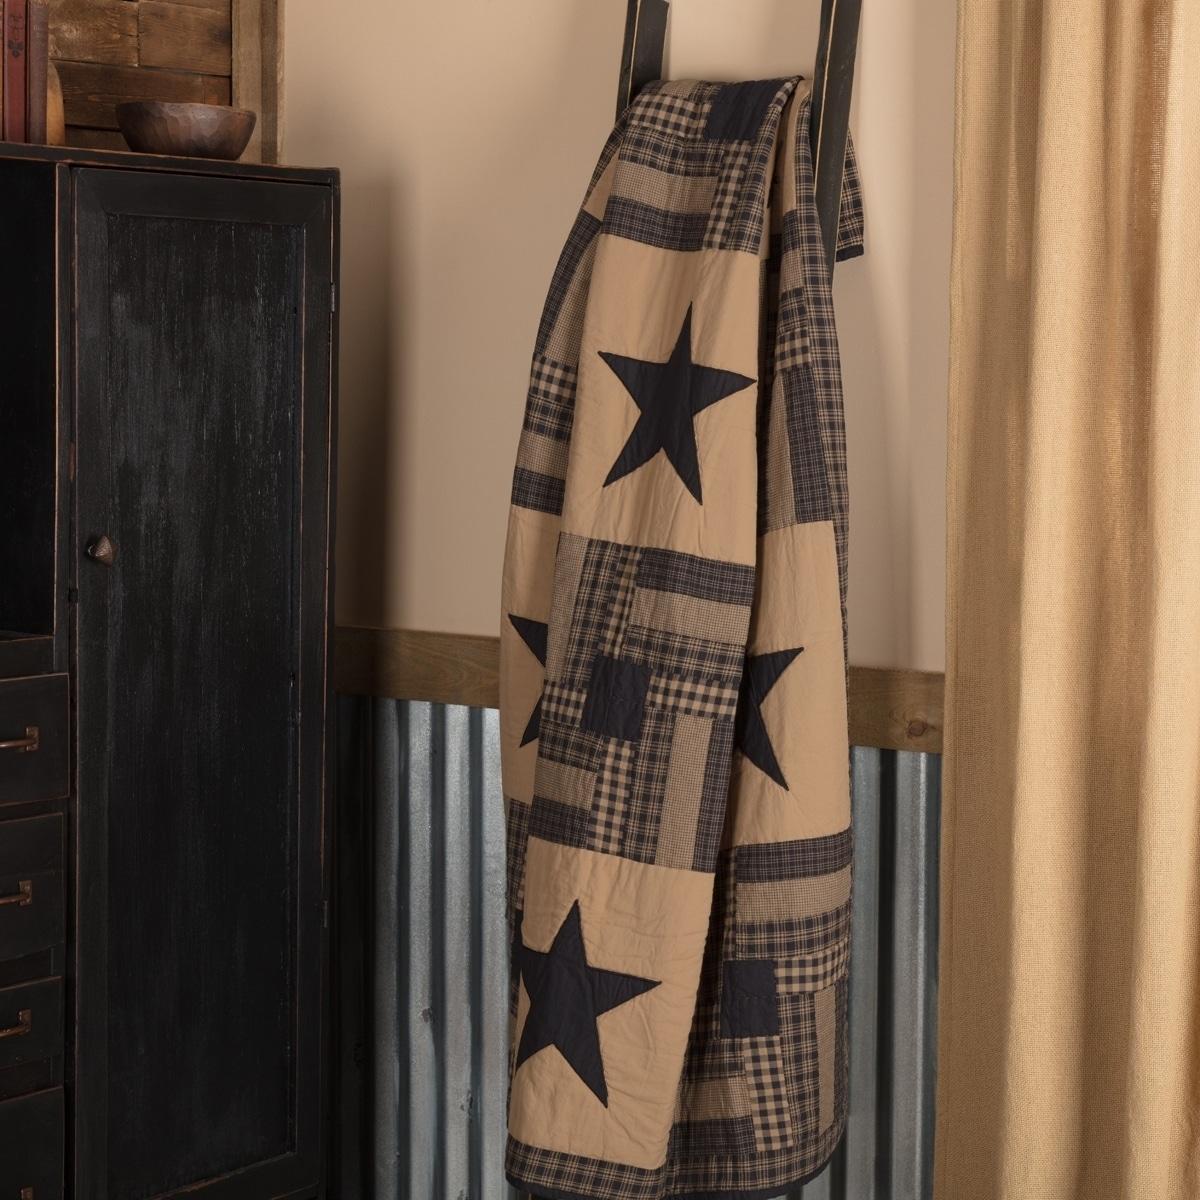 Black Primitive Decor Vhc Black Check Star Throw Rod Pocket Cotton Star Appliqued